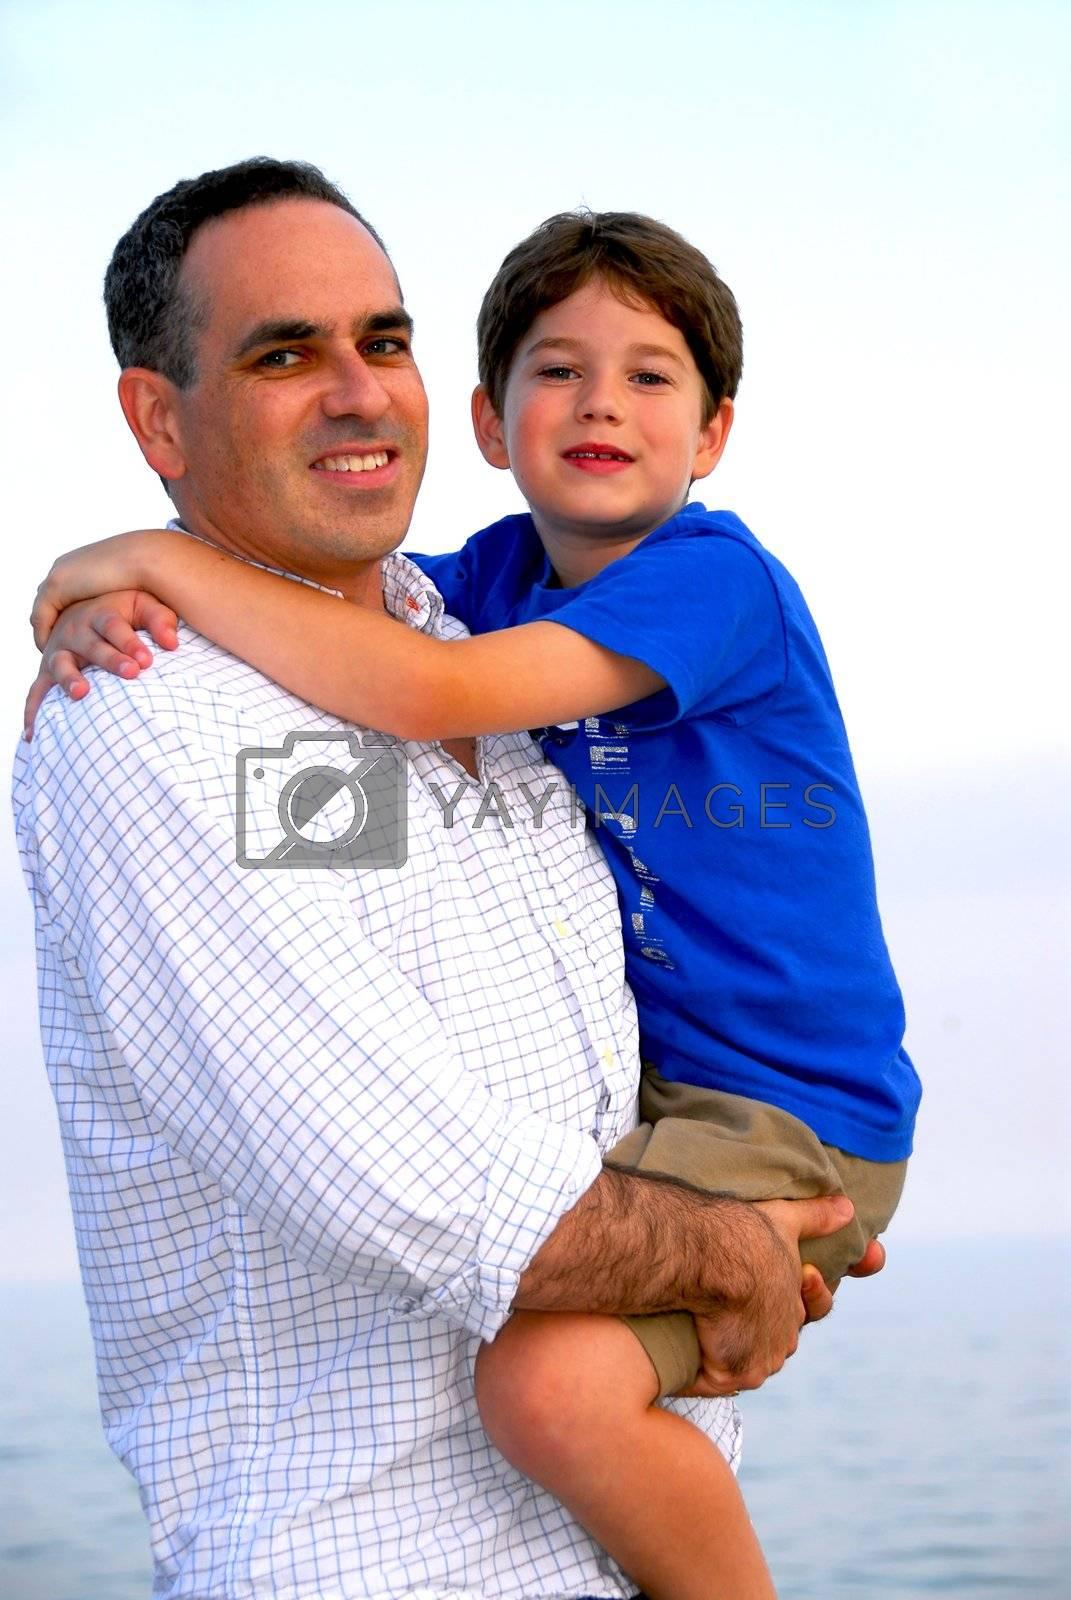 Father son portrait by elenathewise